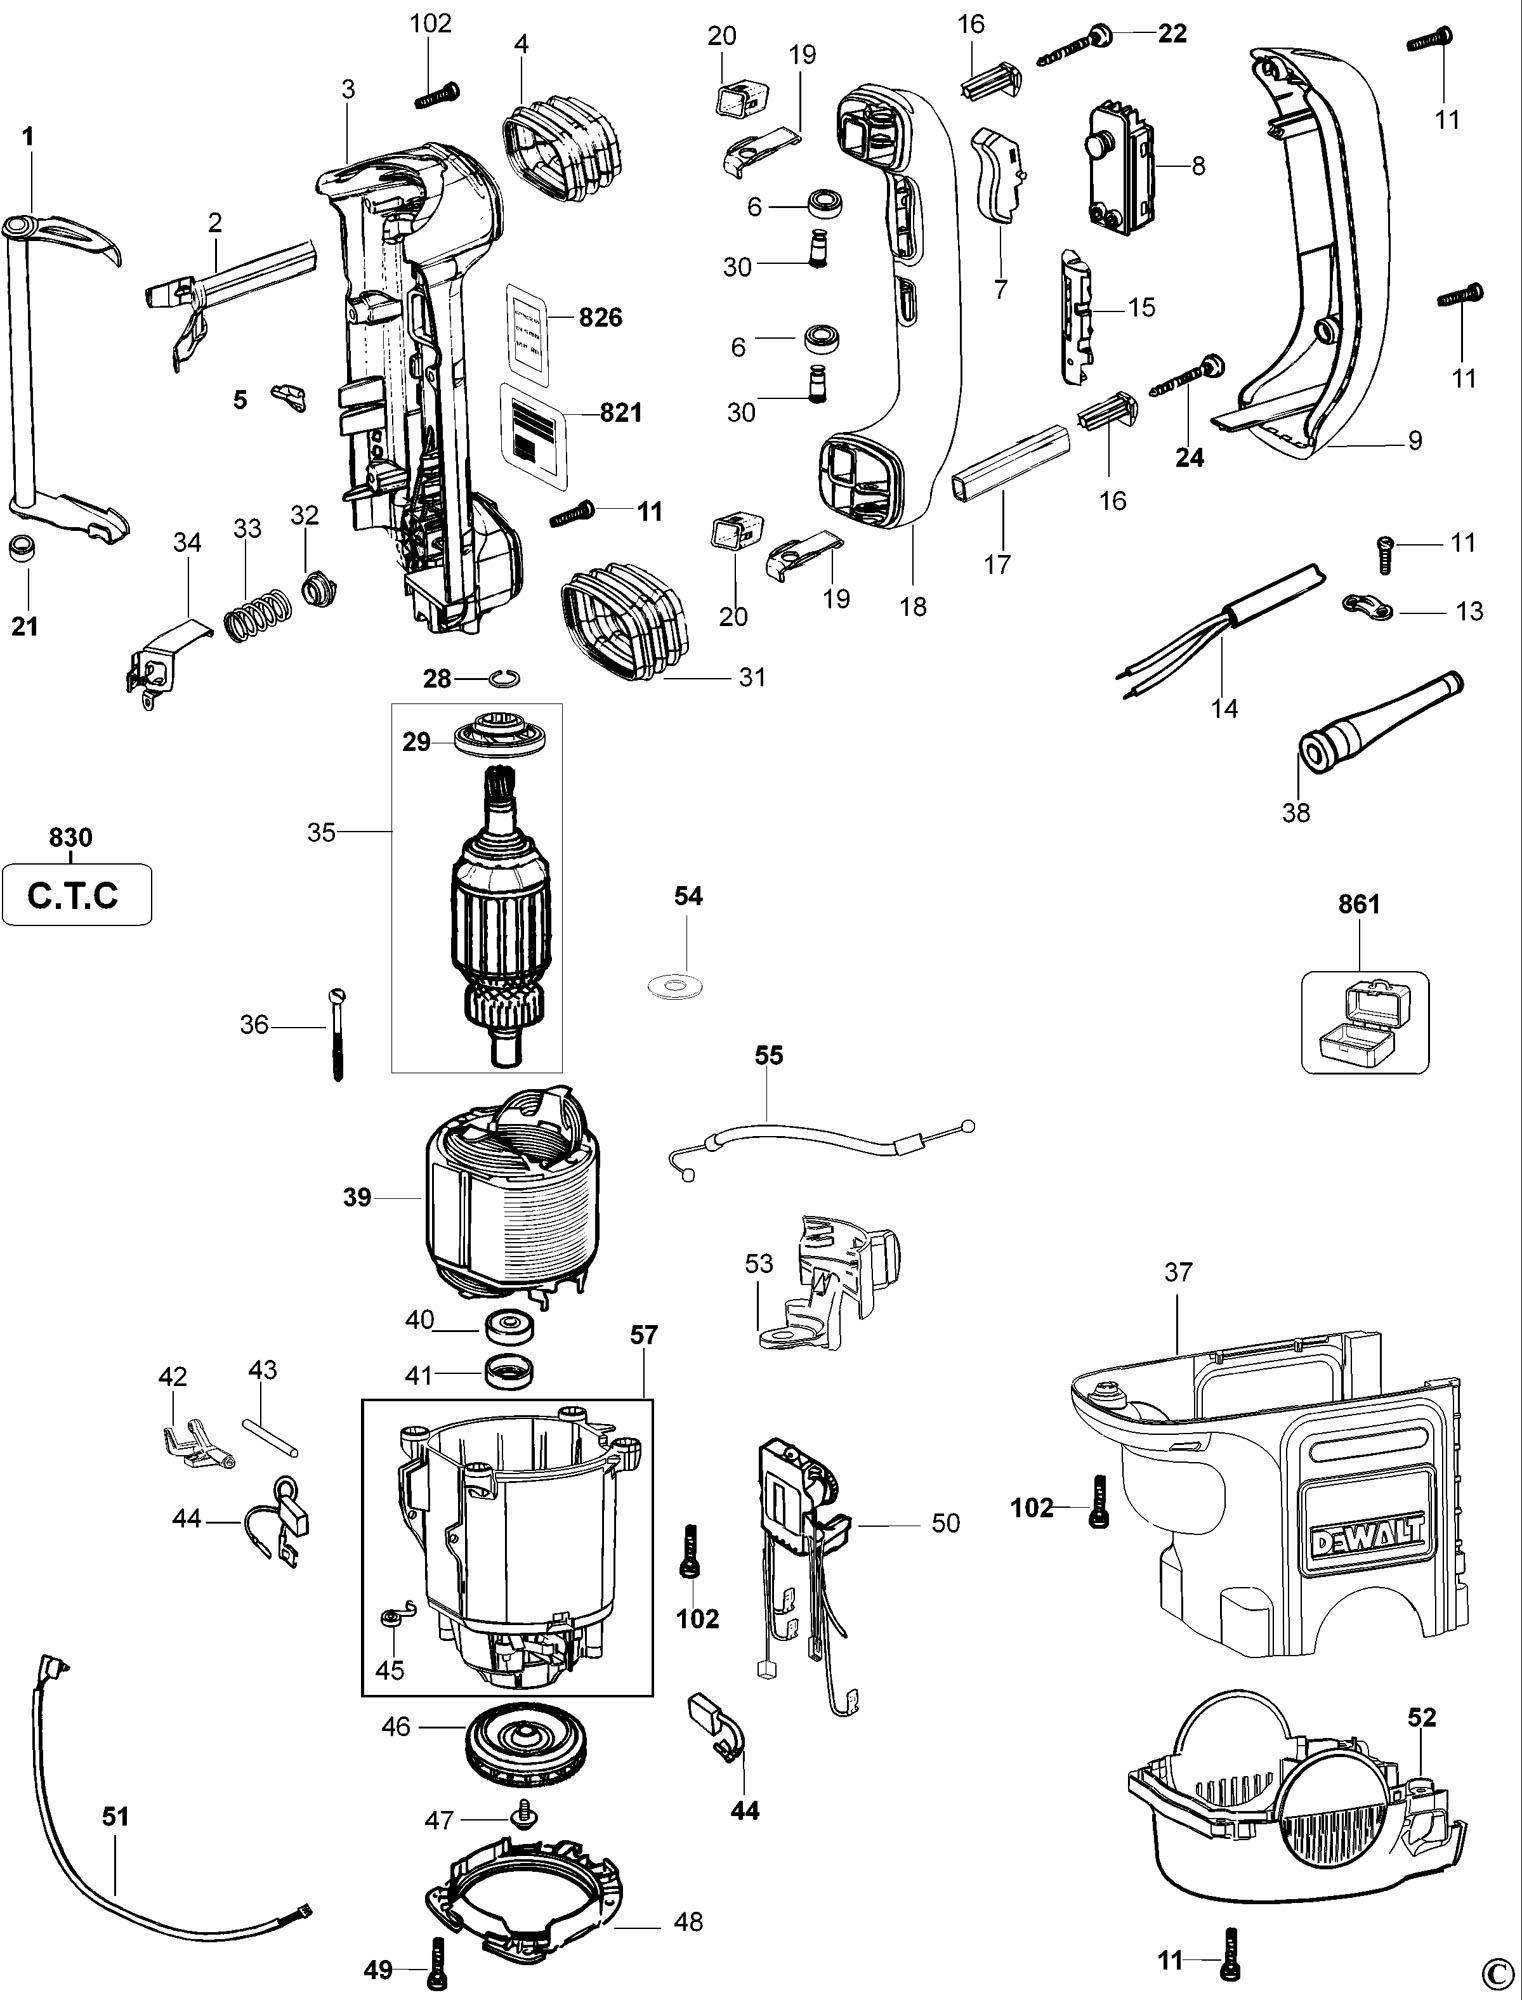 Spares for Dewalt D25730k Rotary Hammer (type 1) SPARE